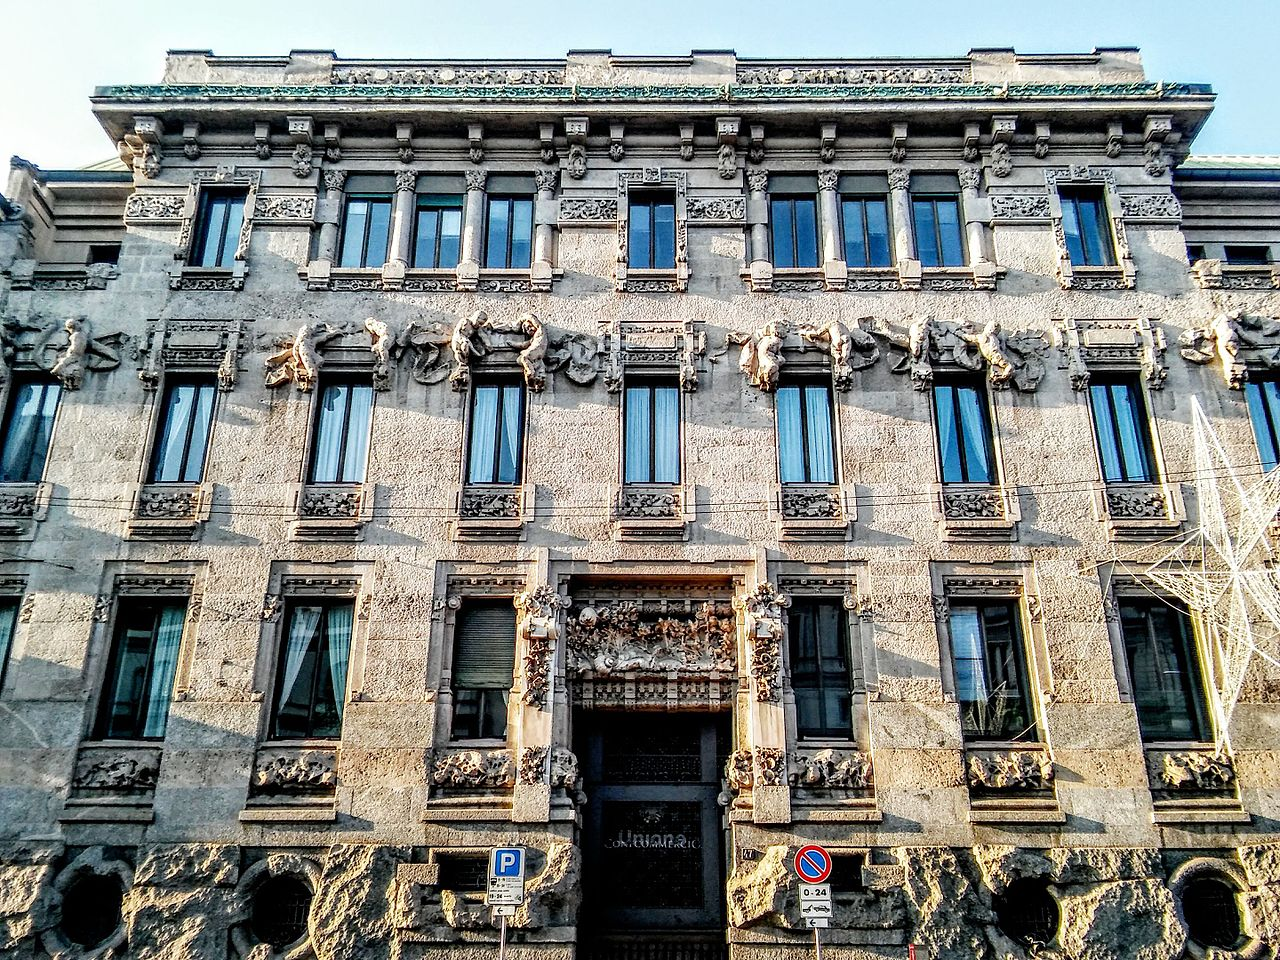 ilclanmariapia Liberty a Milano